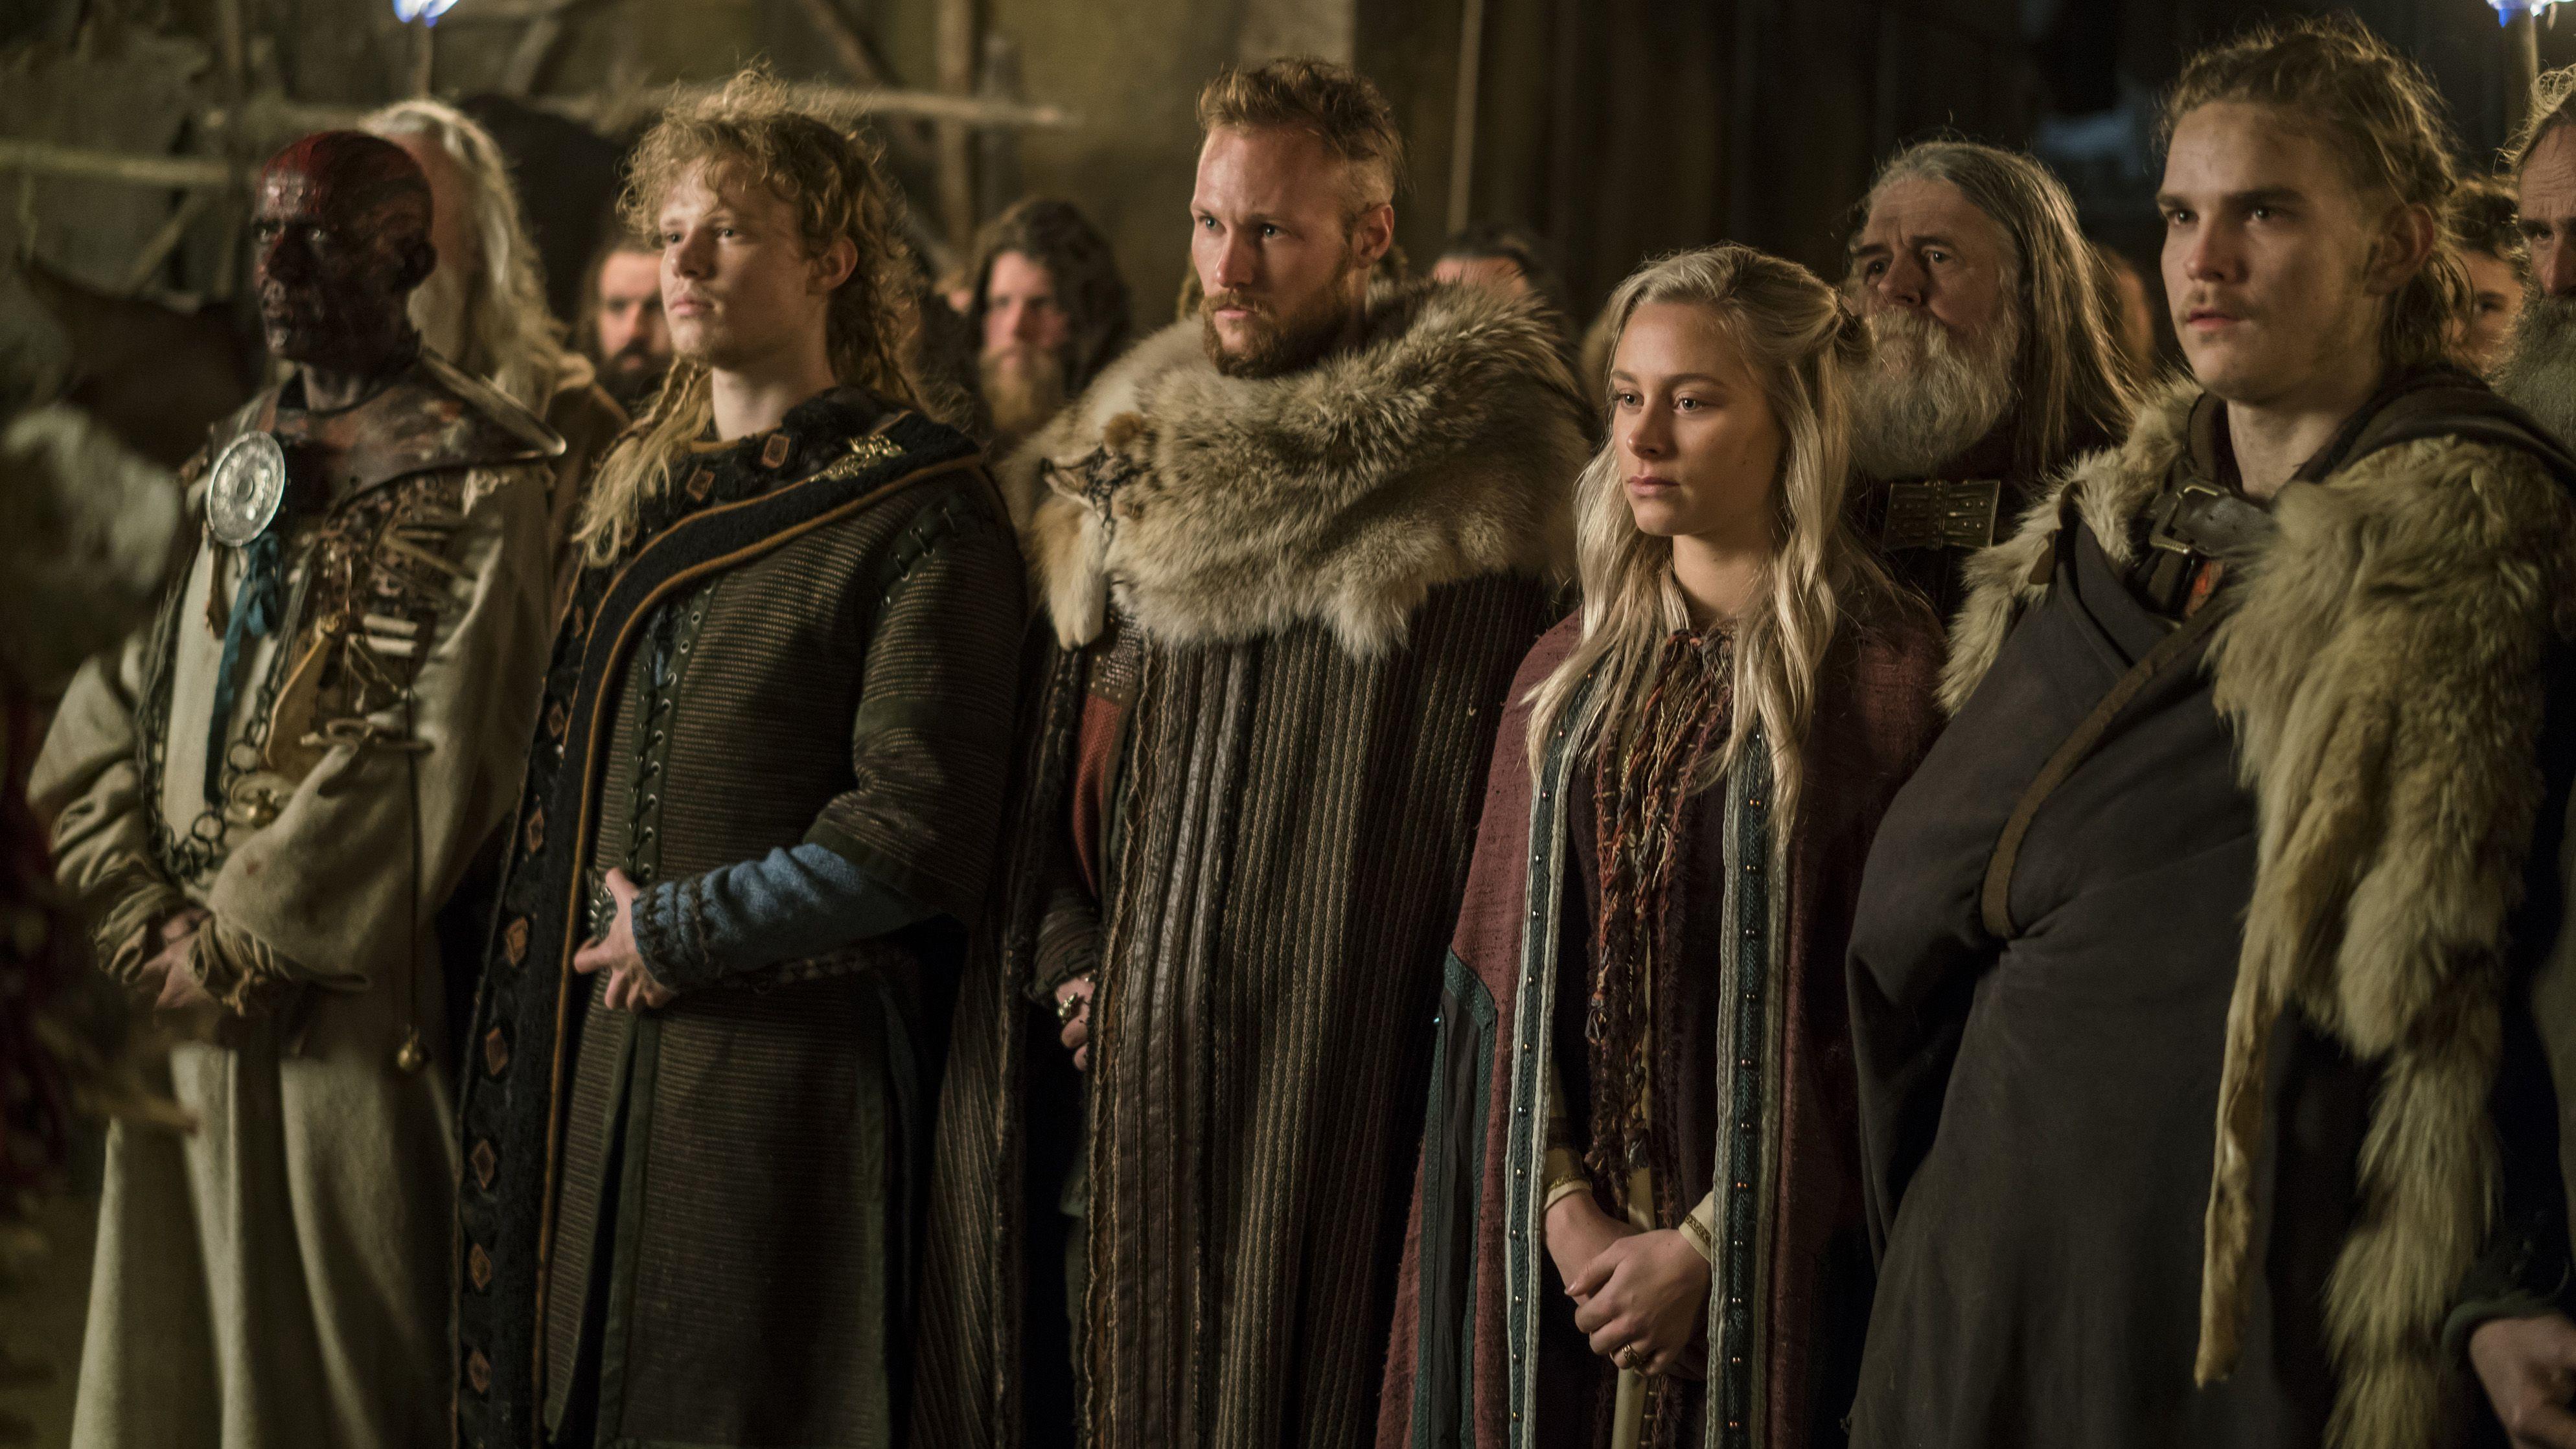 Vikings Ubbe With Hvitserk And Sigurd Vikings Tv Vikings Tv